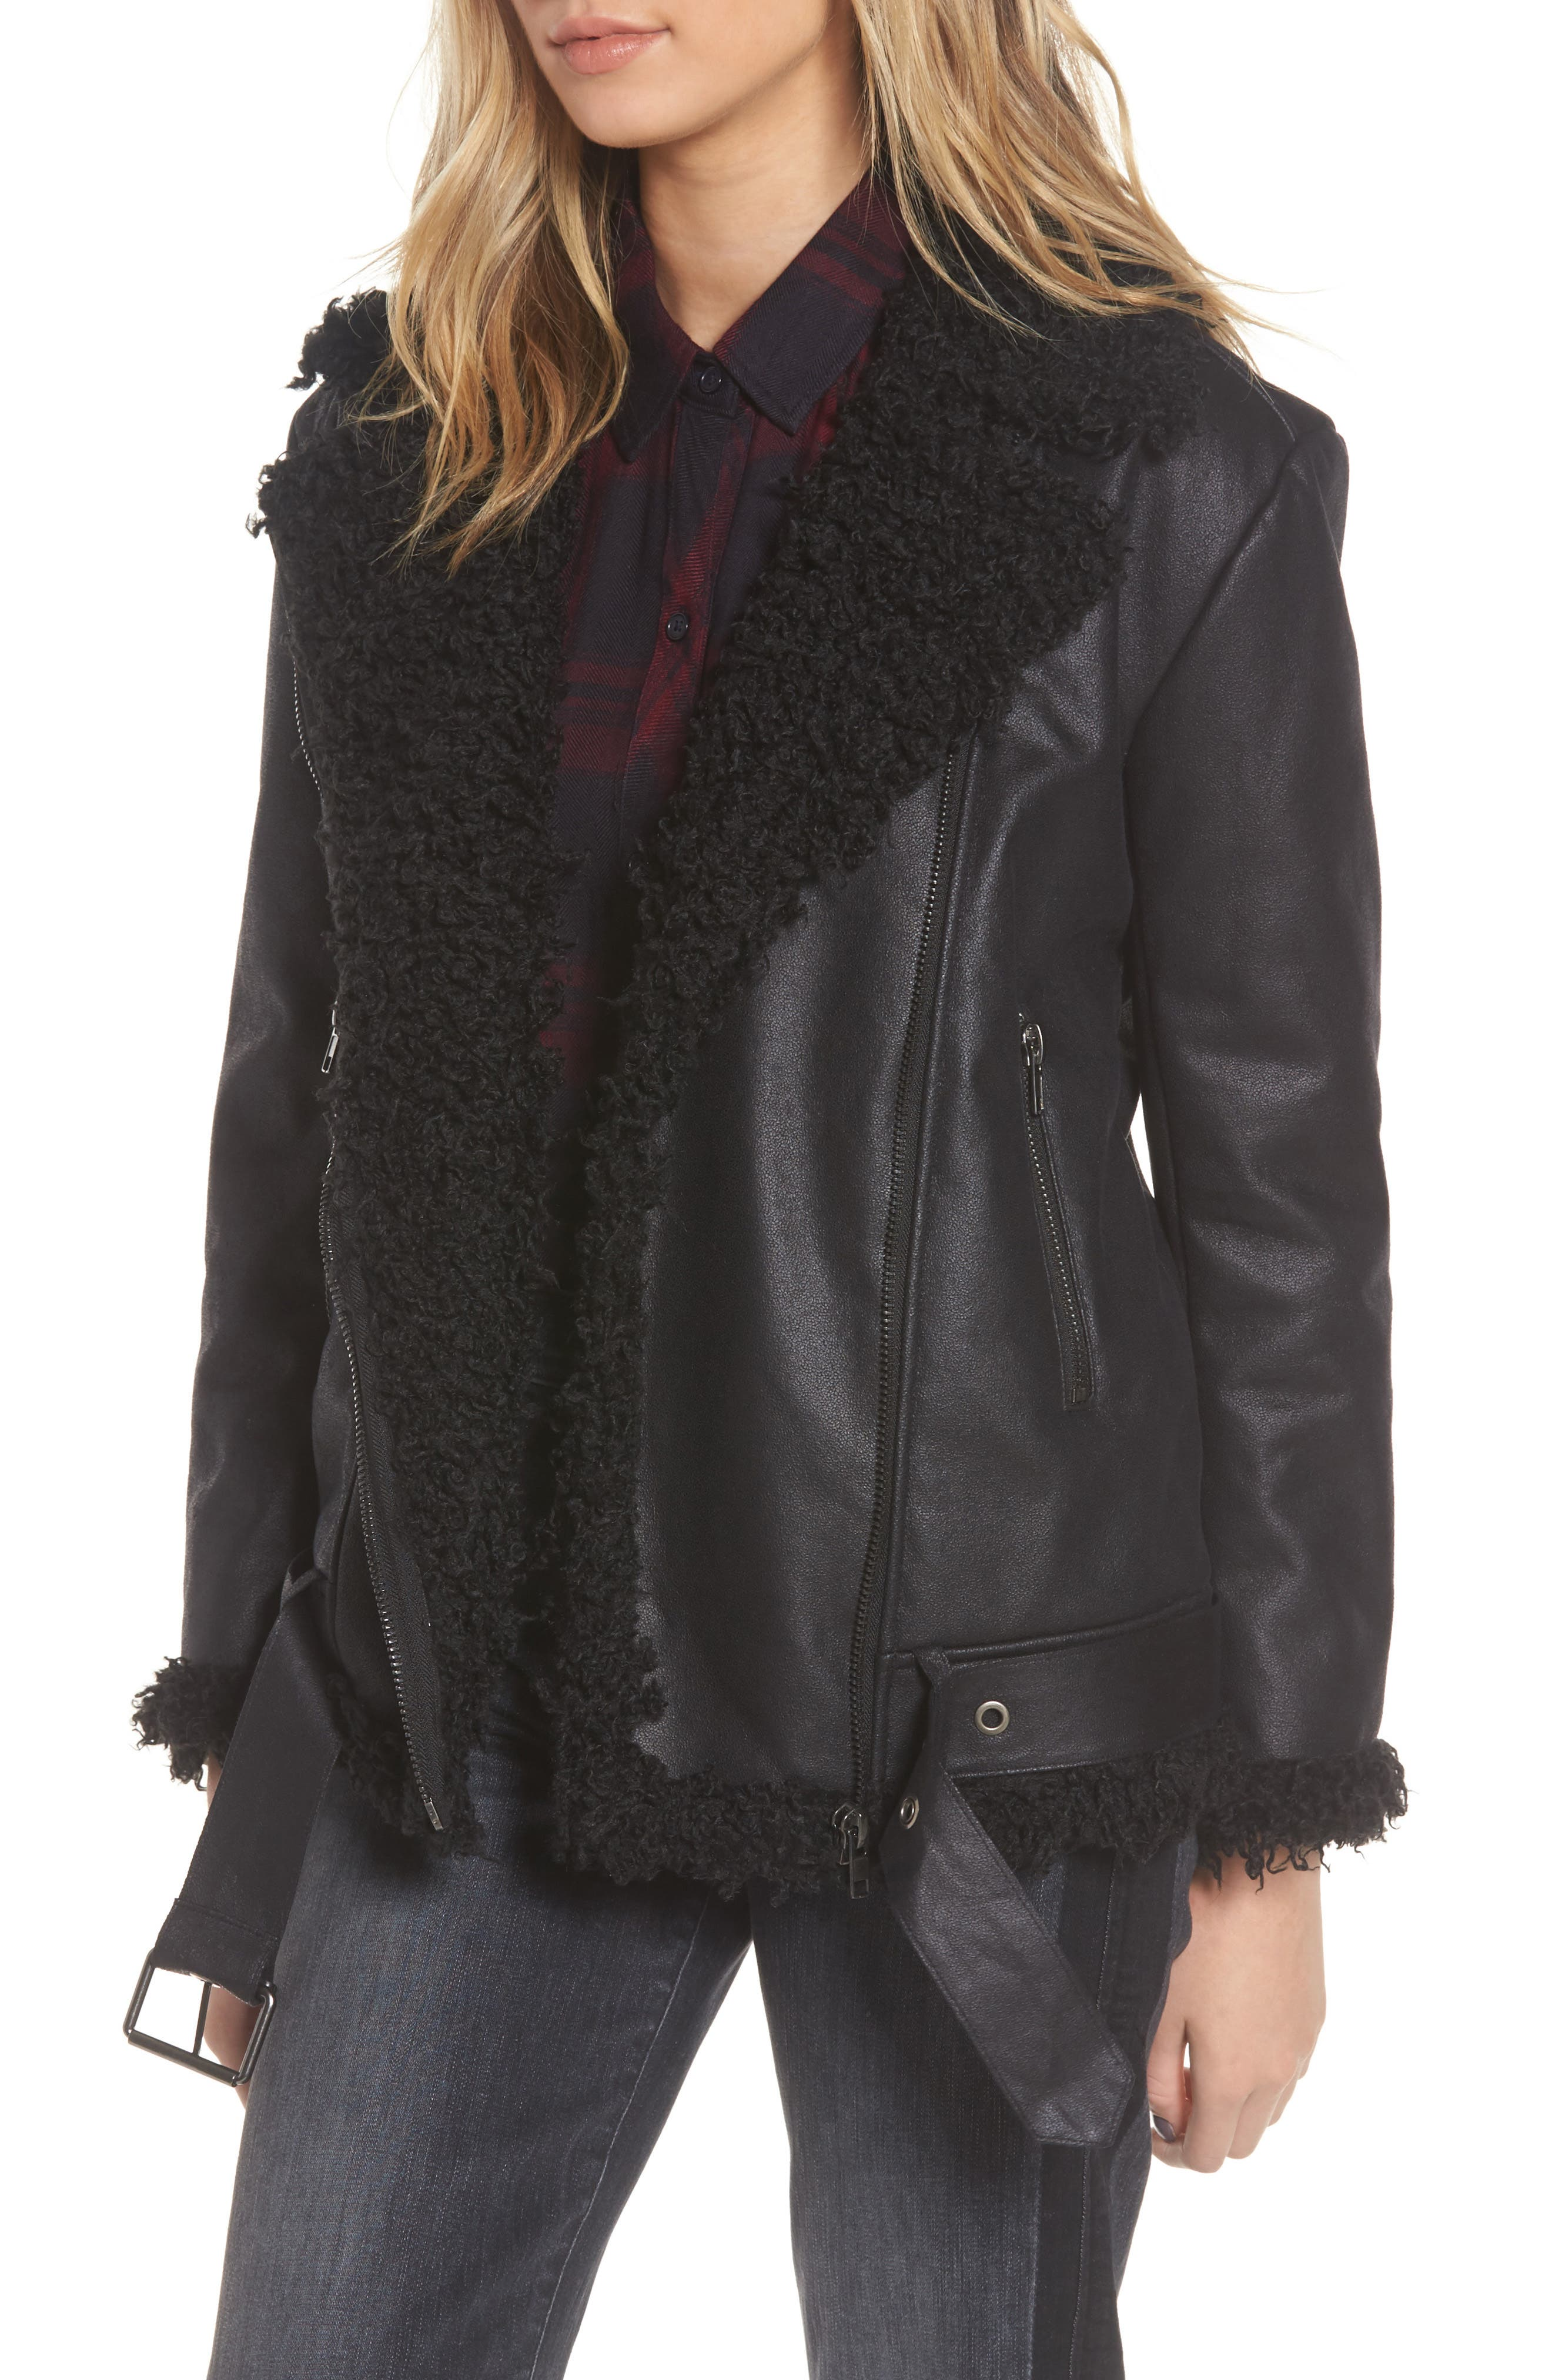 Bosworth Faux Shearling Jacket,                         Main,                         color, Black